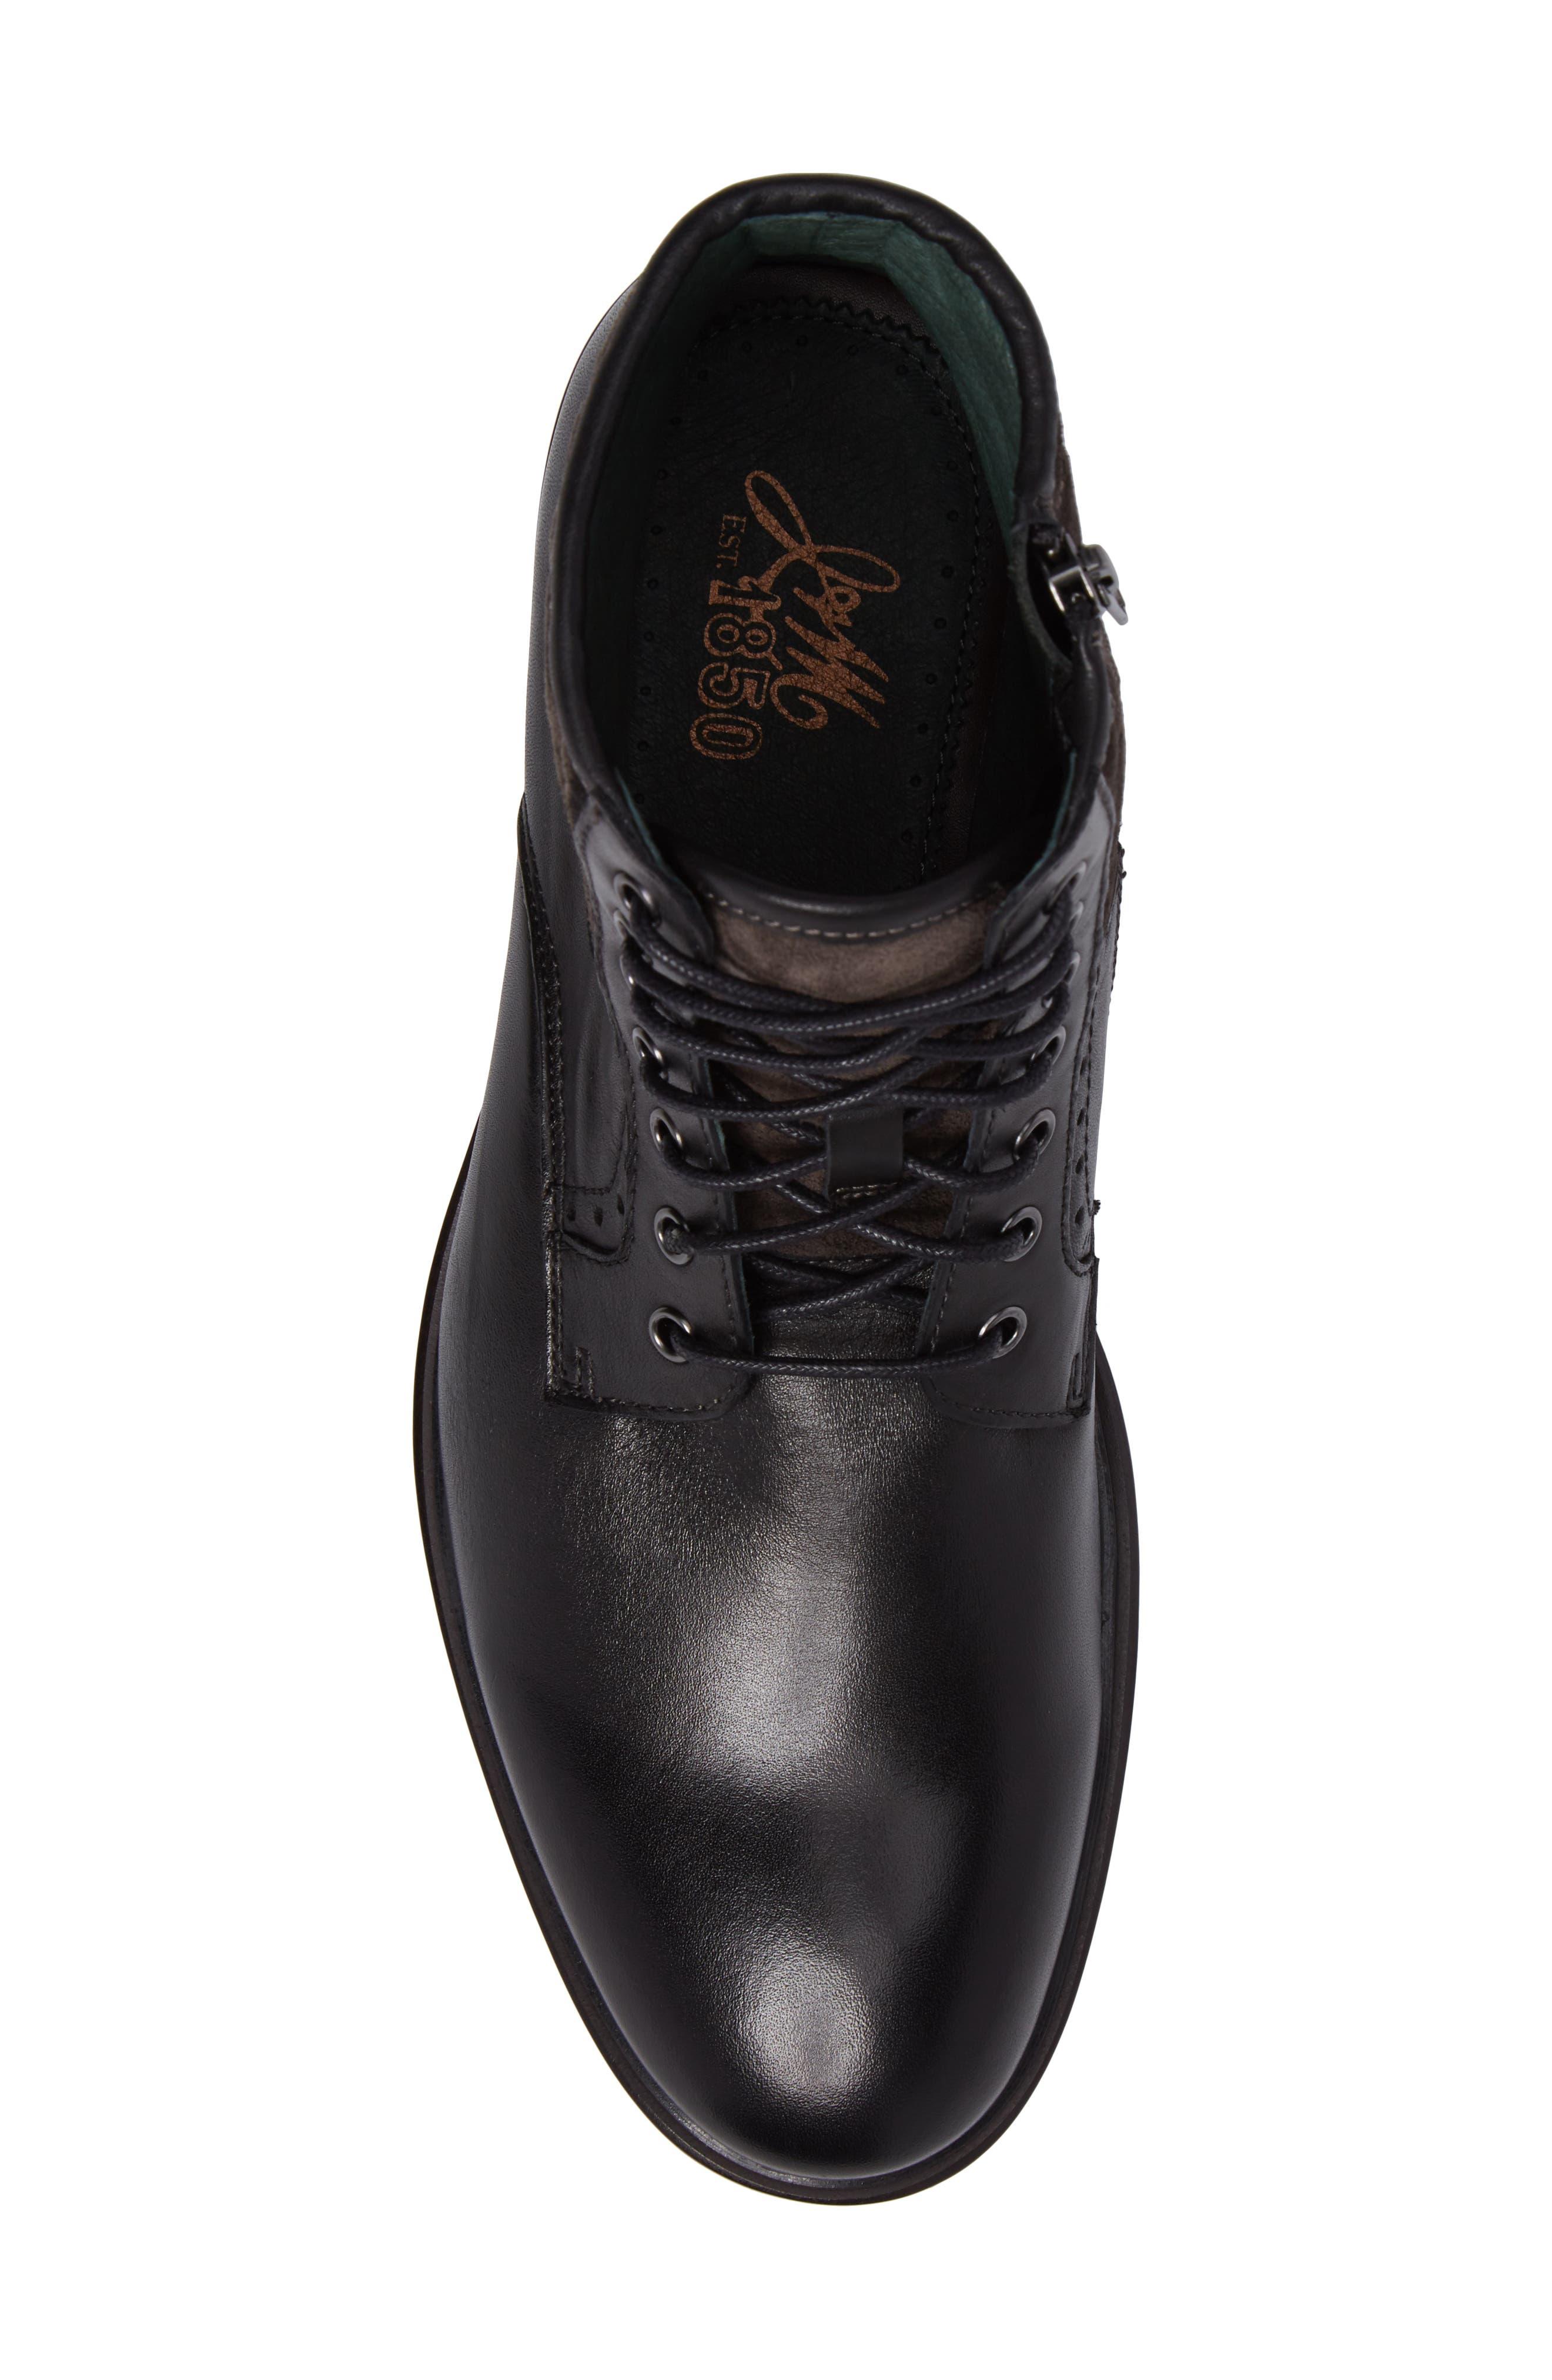 Myles Plain Toe Boot,                             Alternate thumbnail 5, color,                             Black Leather